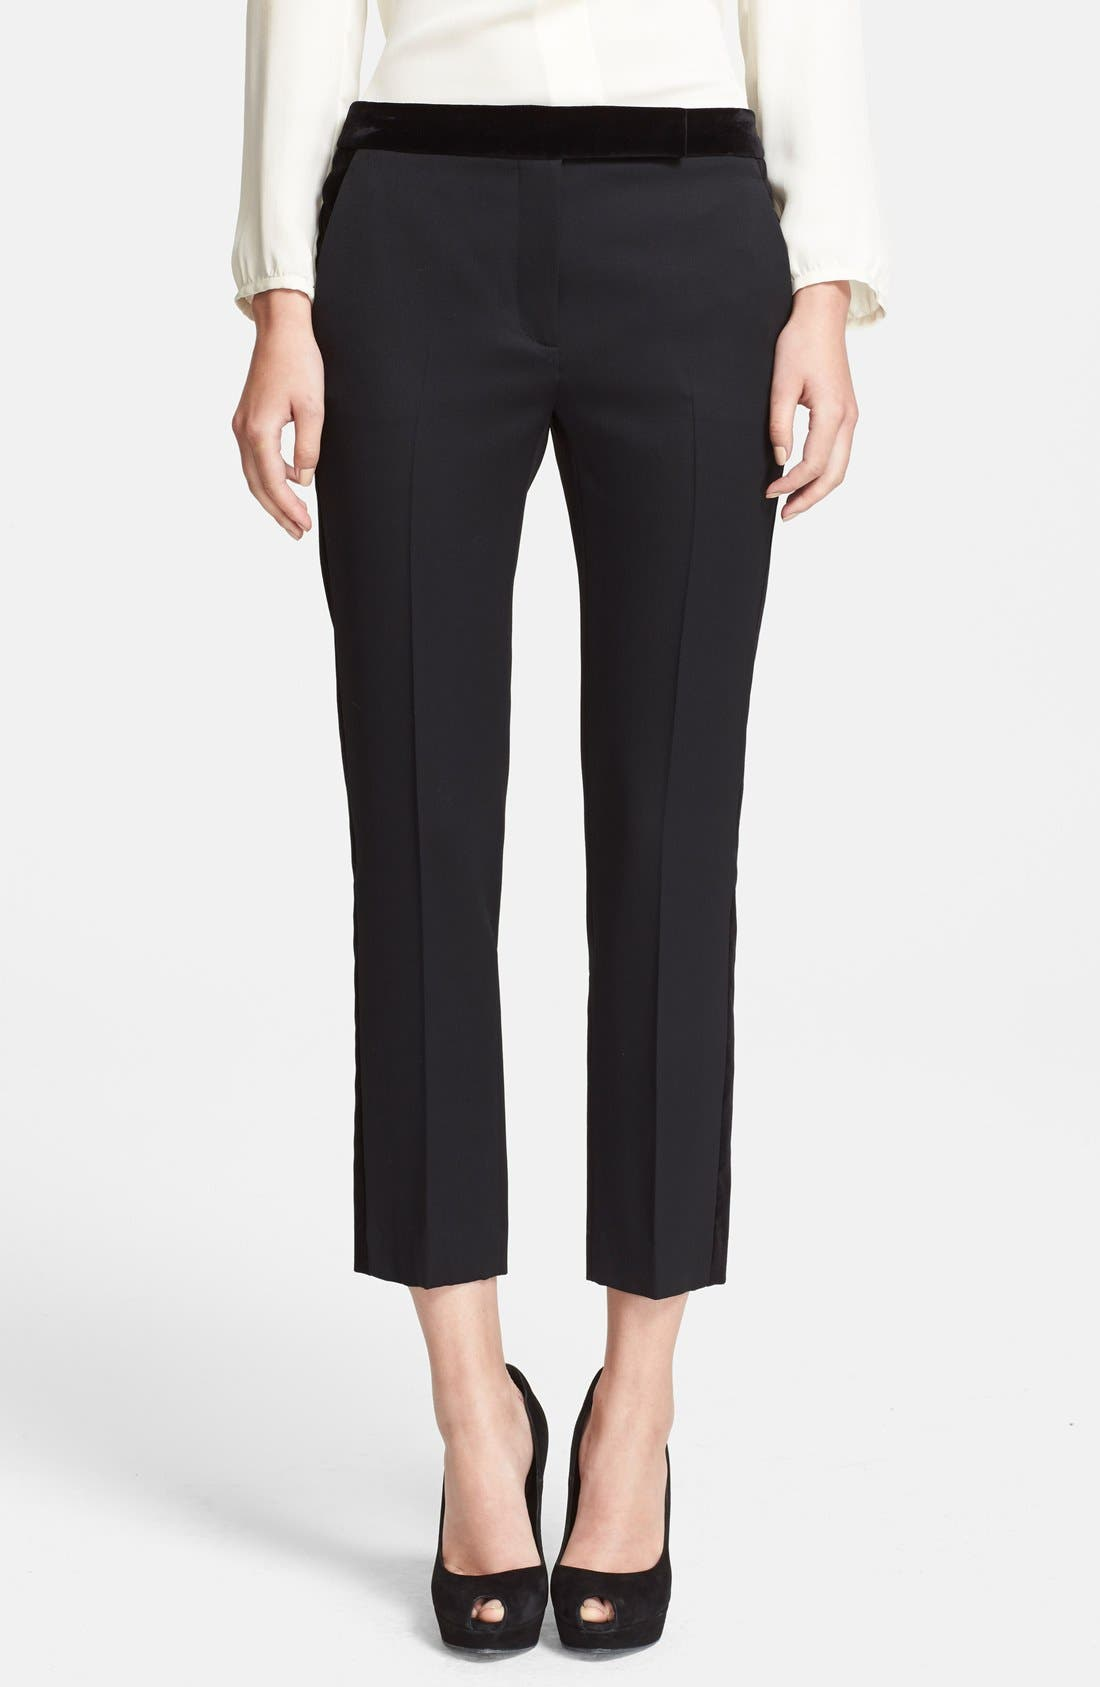 Alternate Image 1 Selected - Alexander McQueen Velvet & Grain de Poudre Crop Pants